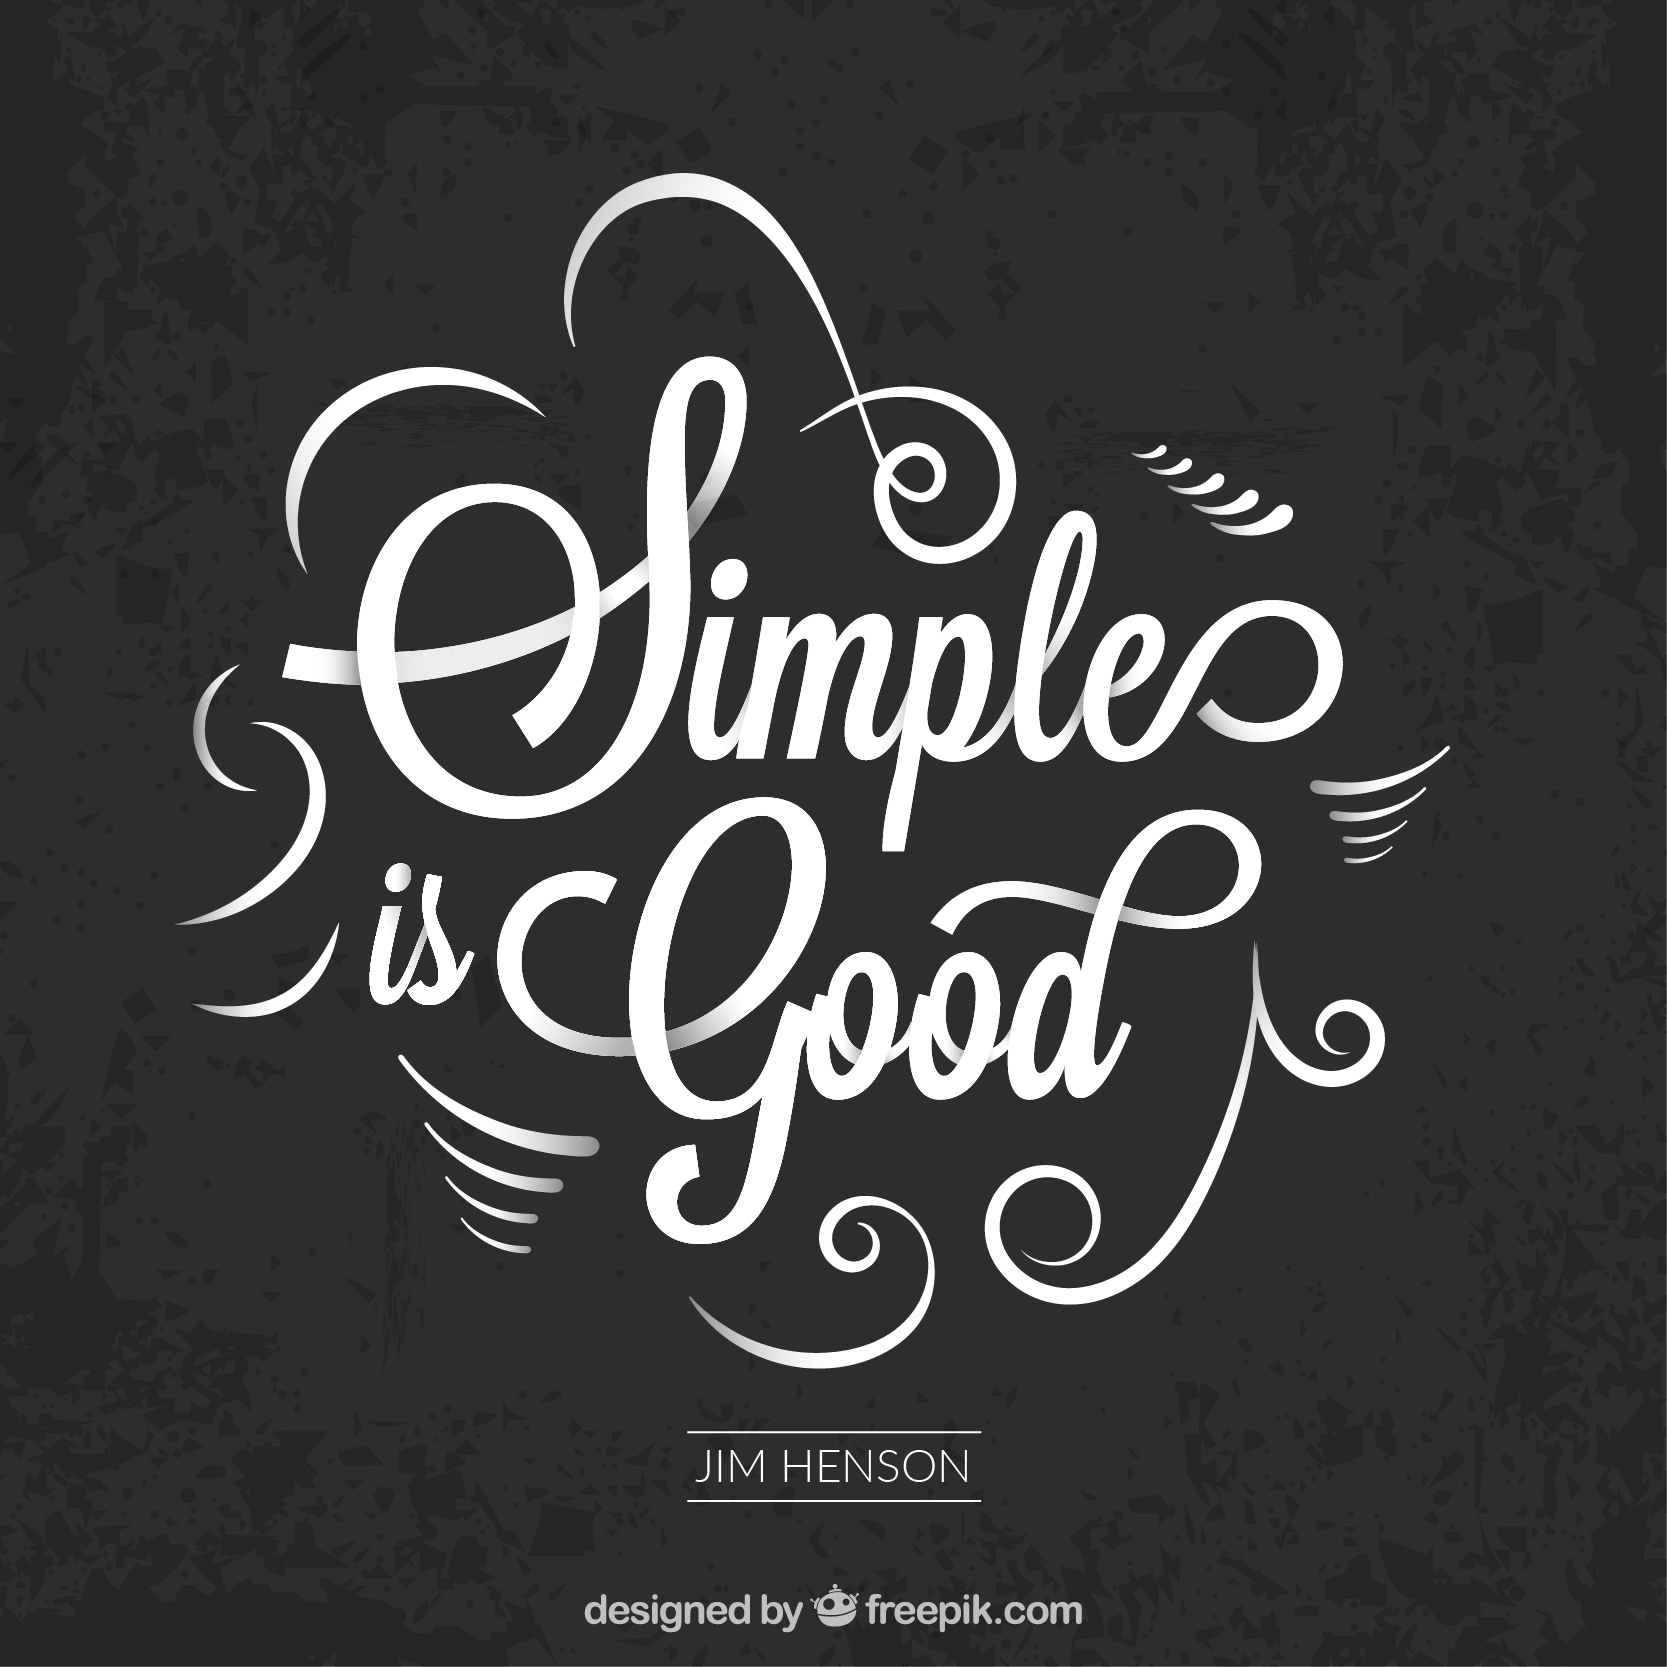 Simple is good